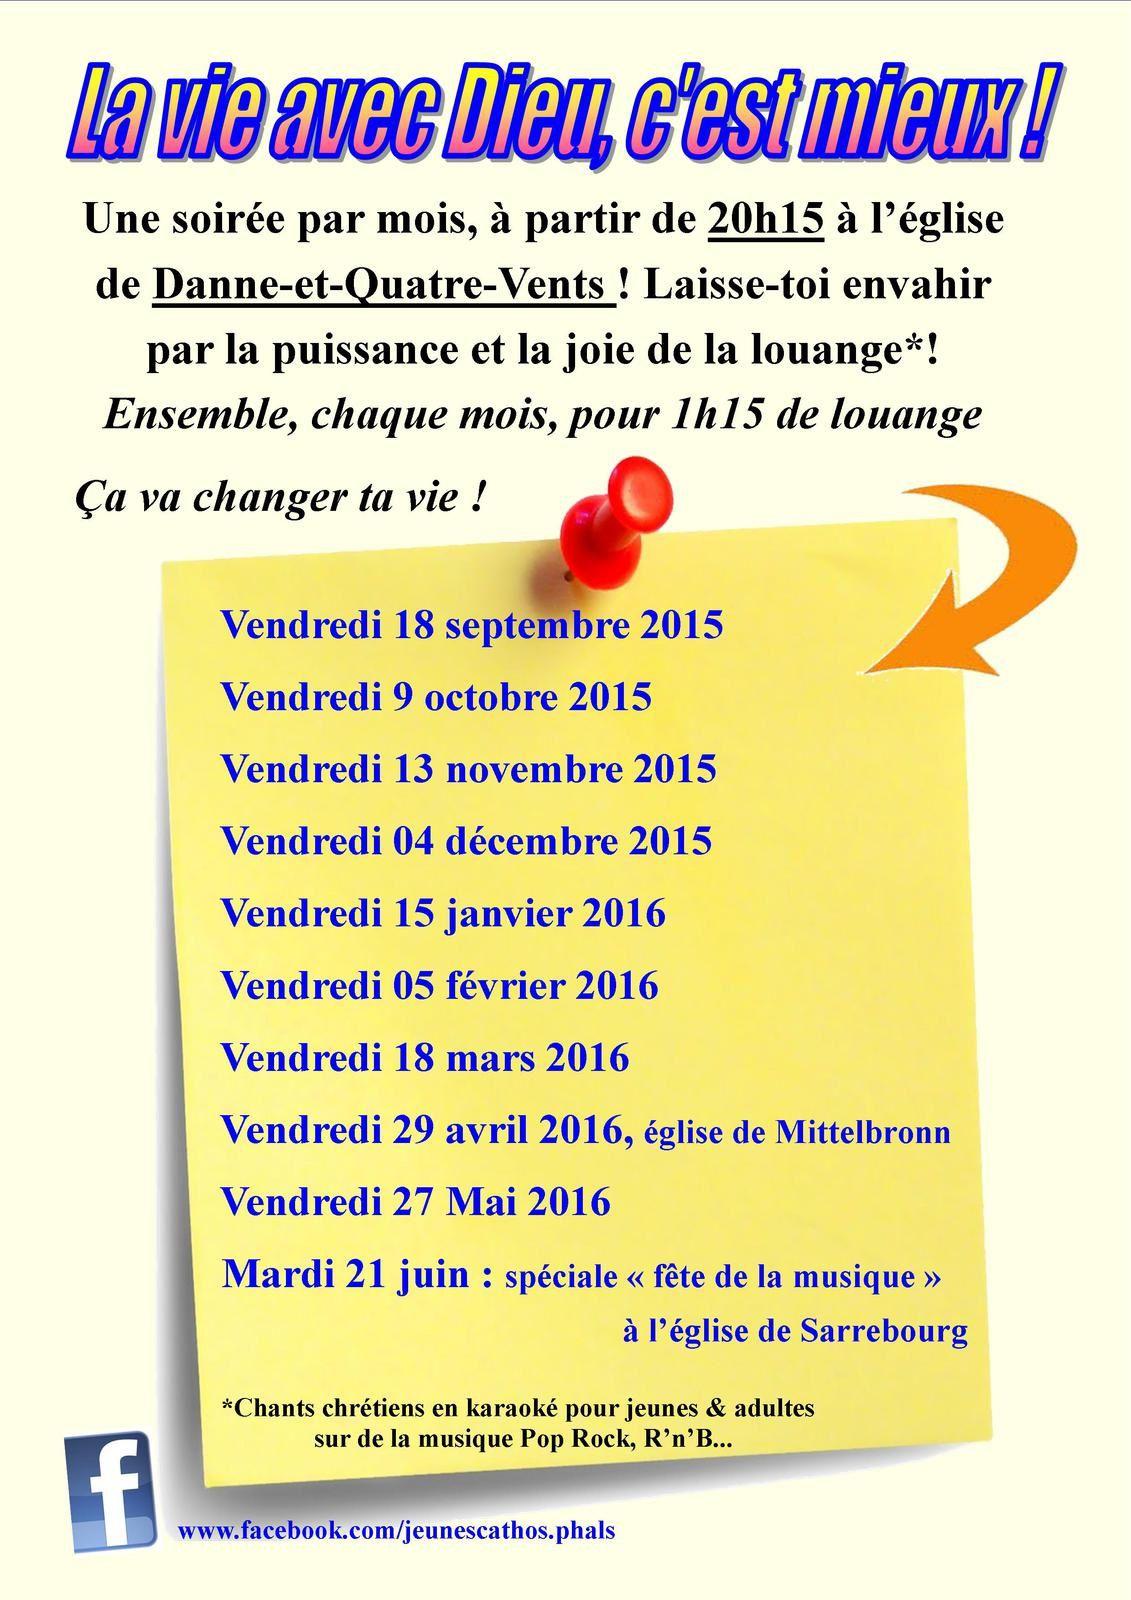 Top Louange: saison 2015-2016